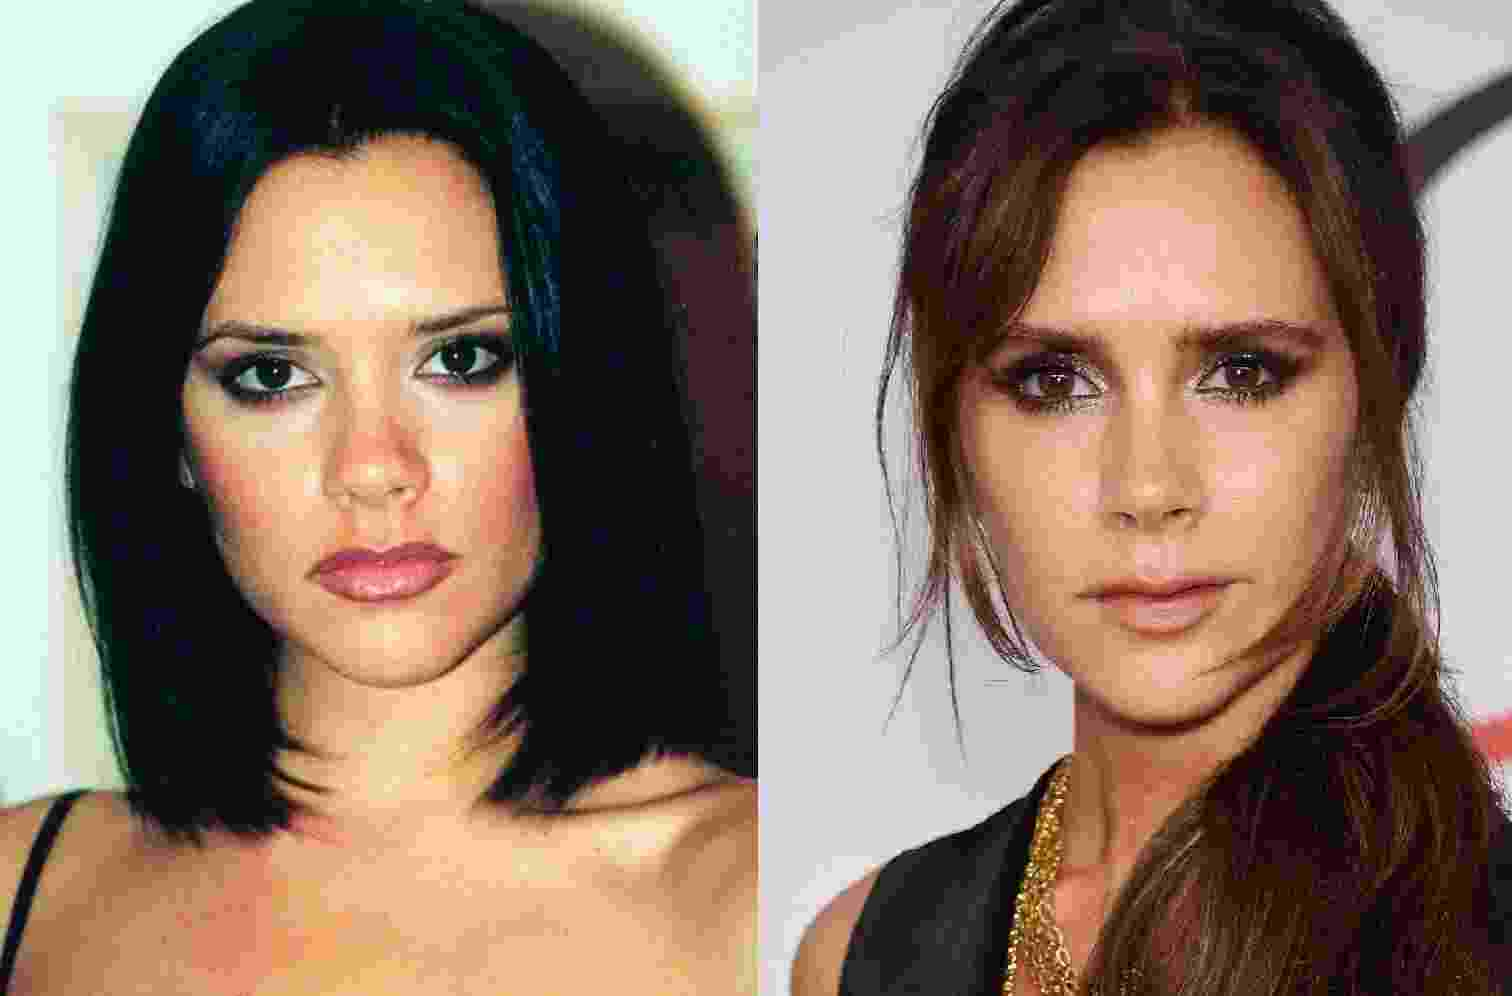 Antes e depois - Getty Images